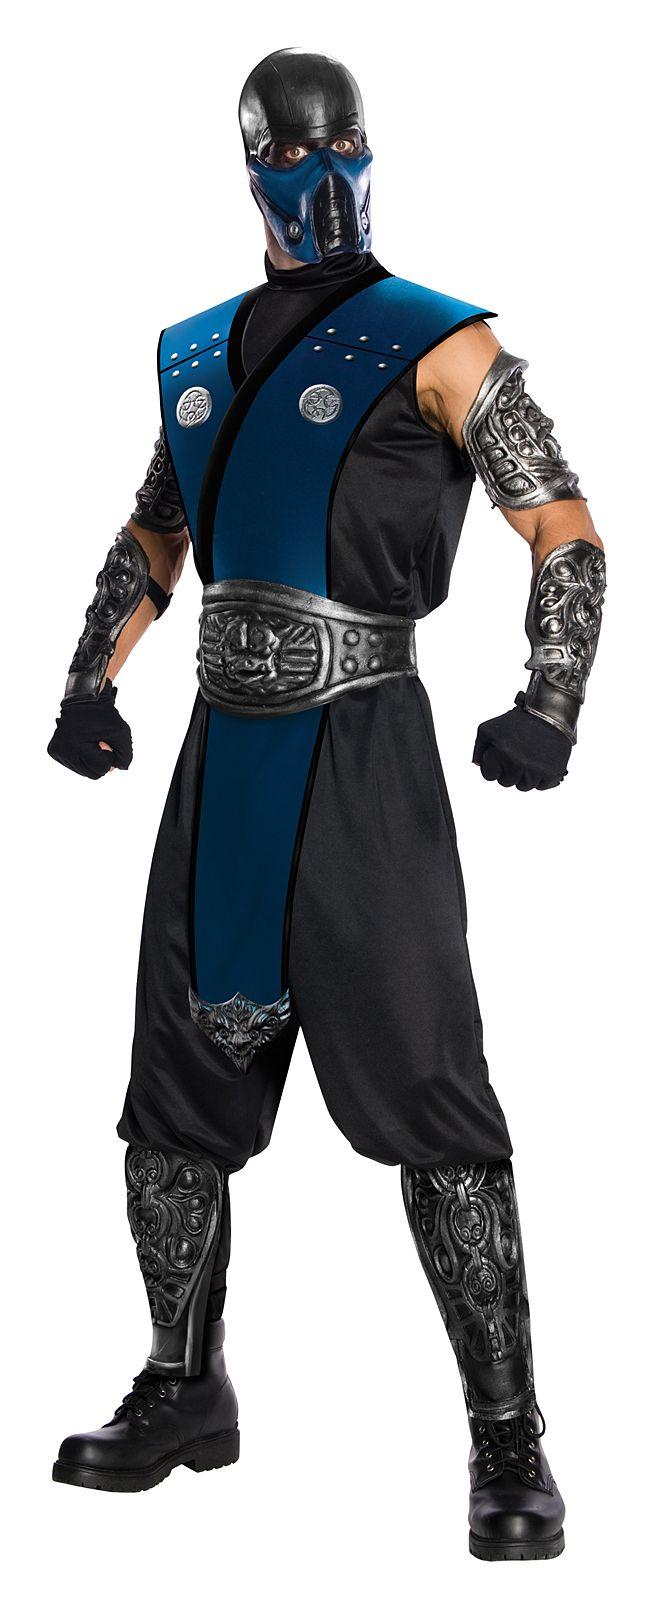 Mortal Kombat Subzero Ninja Mens Fancy Dress Up Halloween Costume Outfit + Mask,